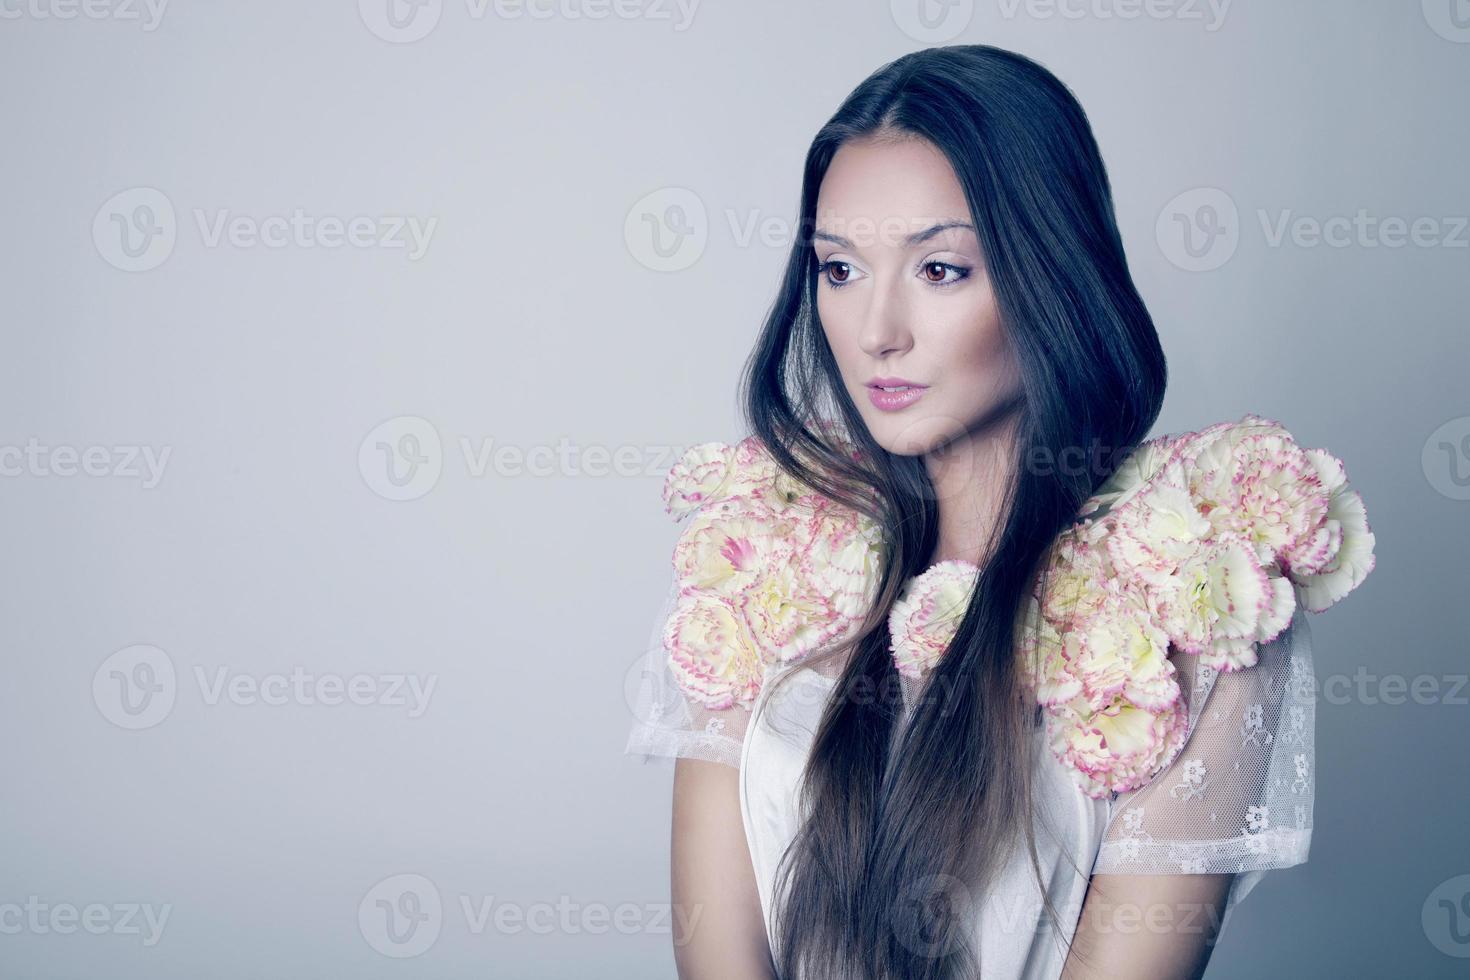 schoonheid portret van brunette jong meisje, lente. foto